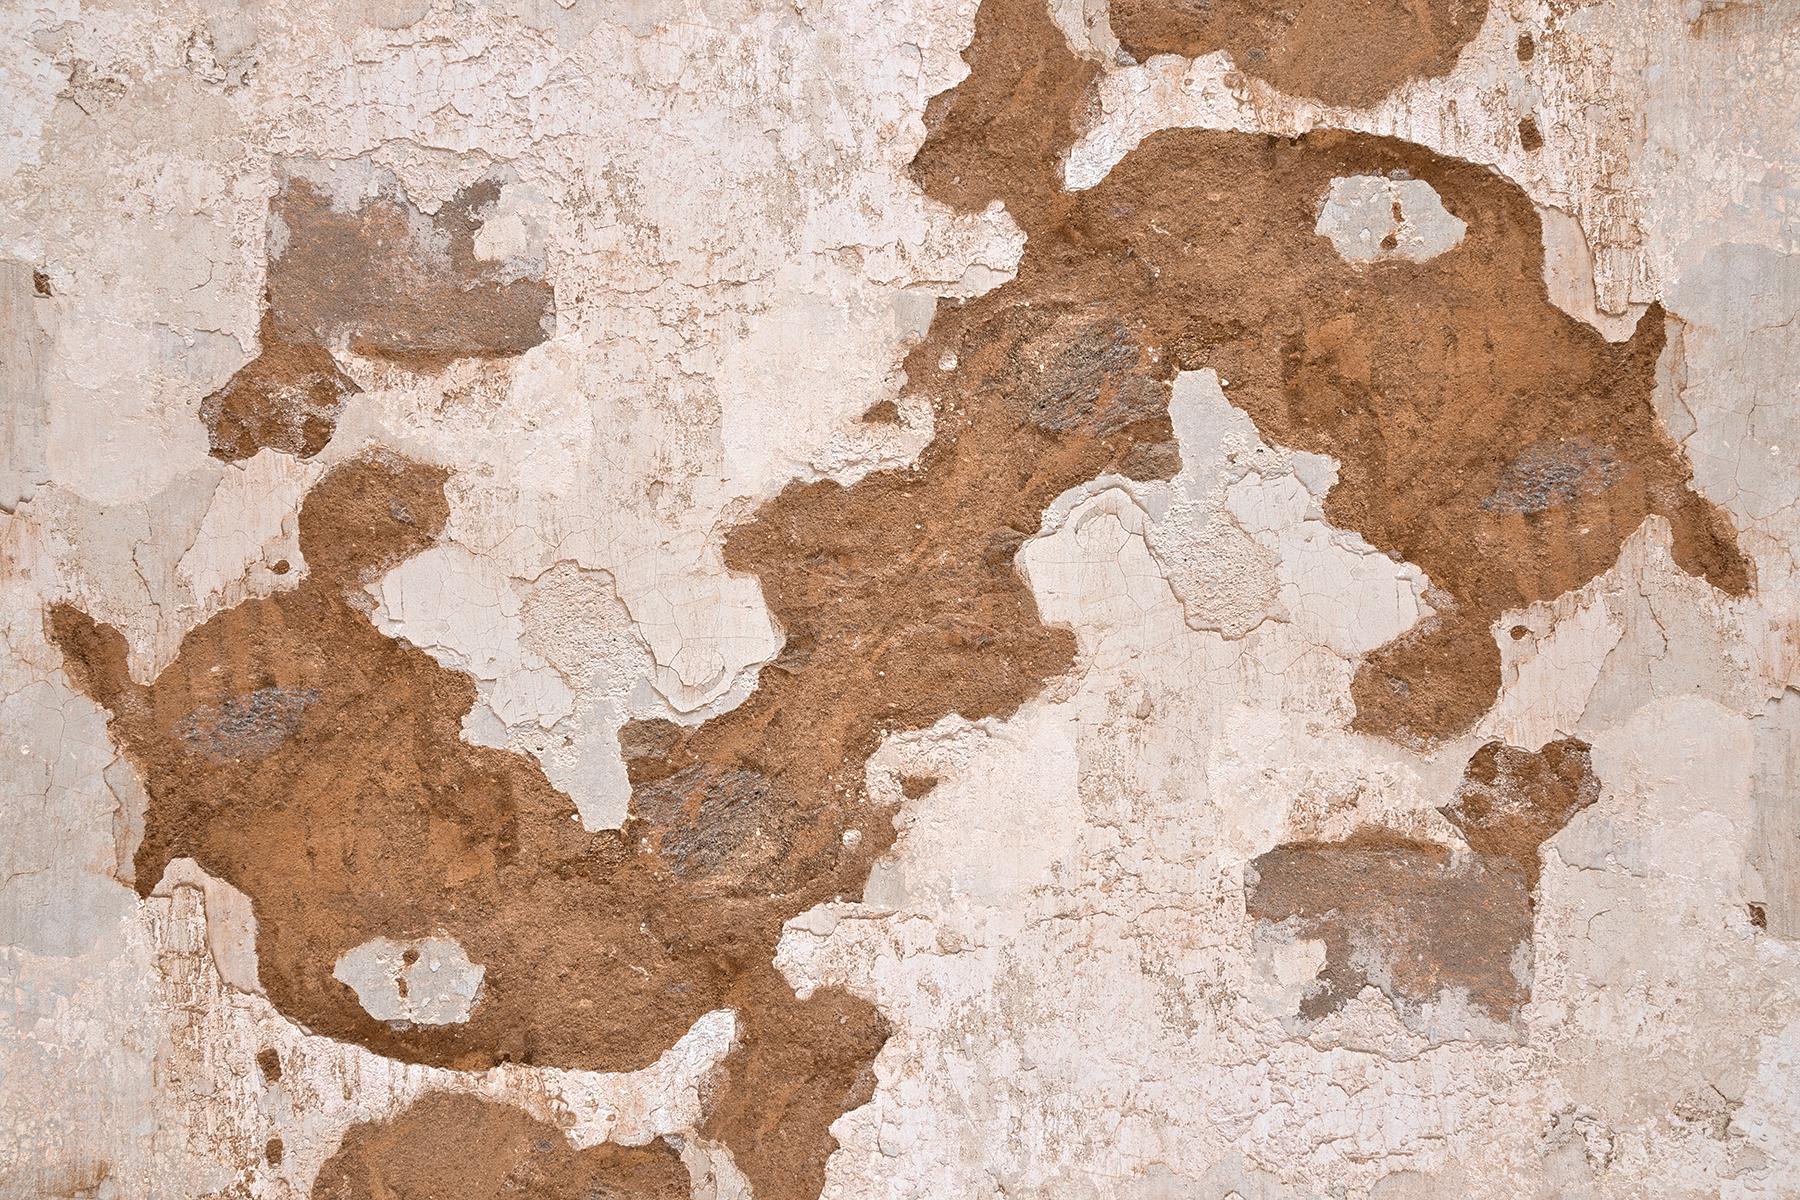 Chimera grunge wall - hdr texture photo